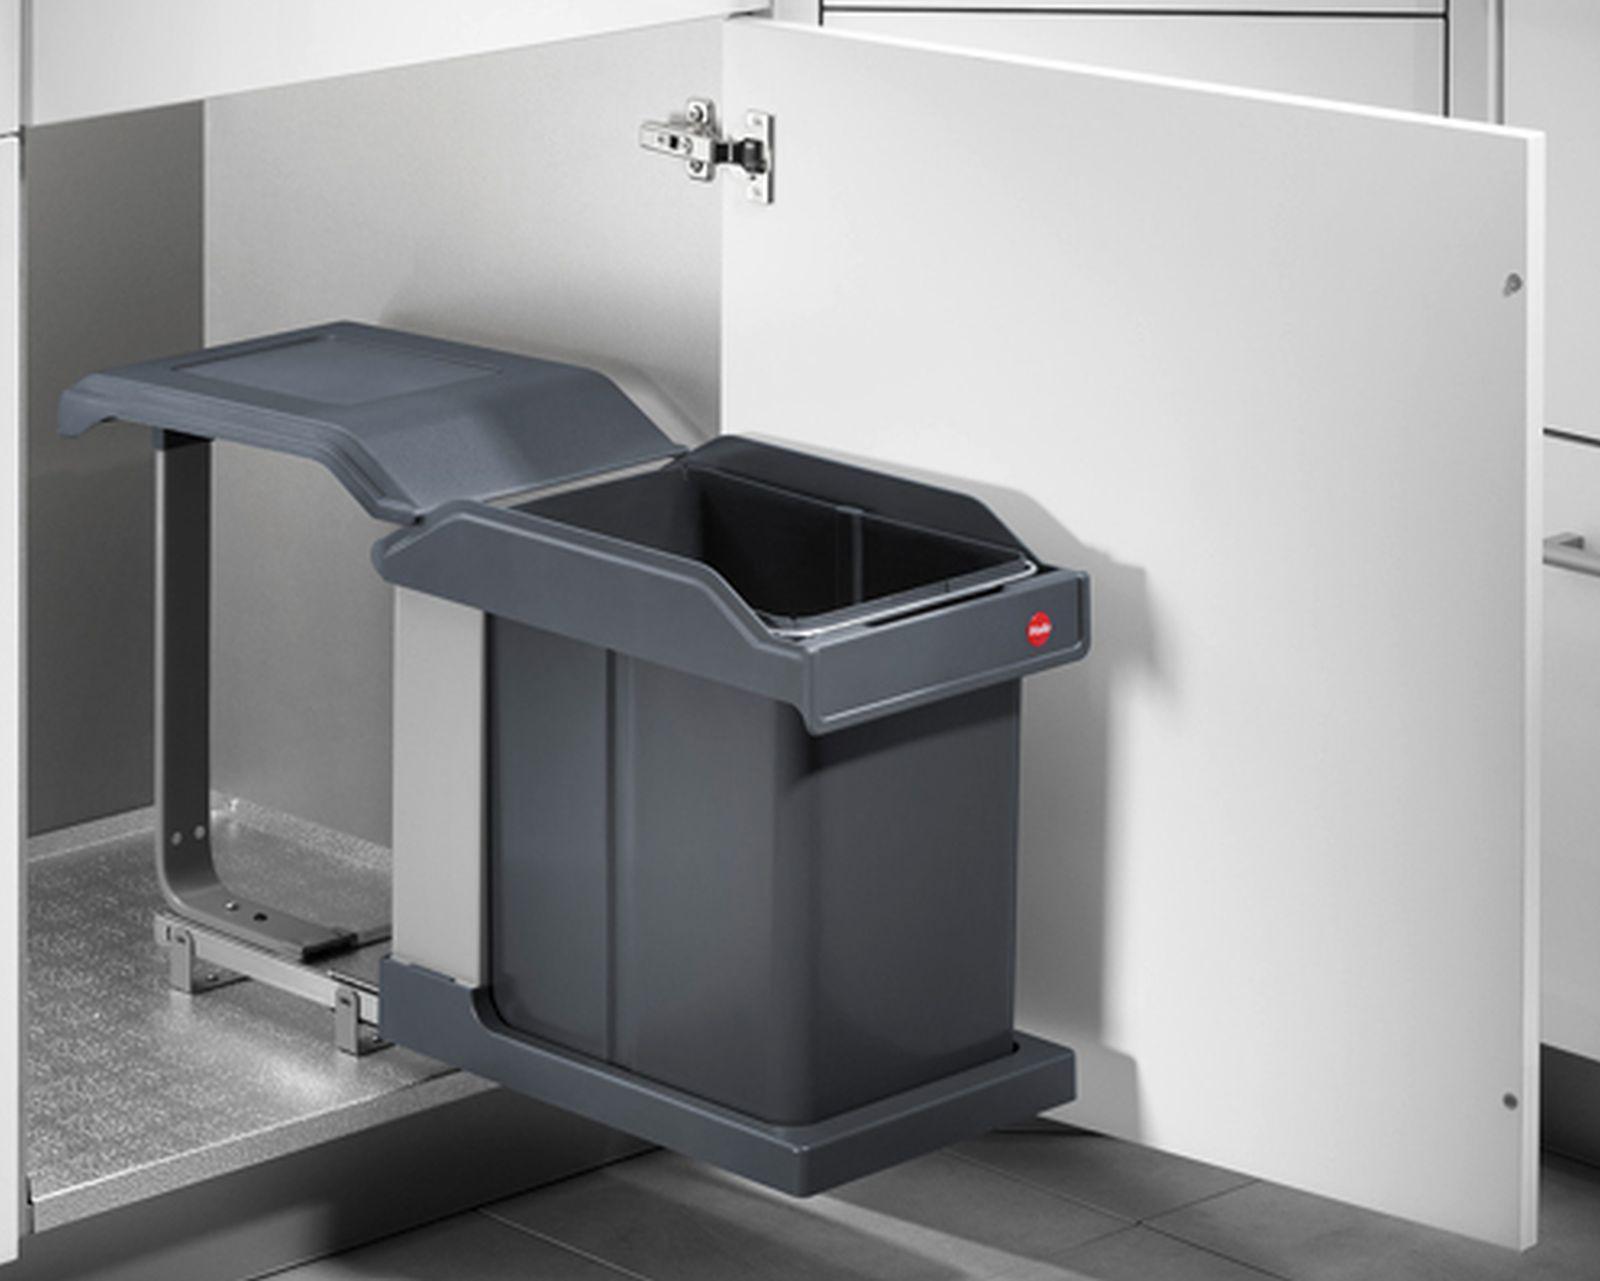 Badezimmer Mülleimer Grau ~ Abfalleimer Küche  abfalleimer küche, abfalleimer küche einbau